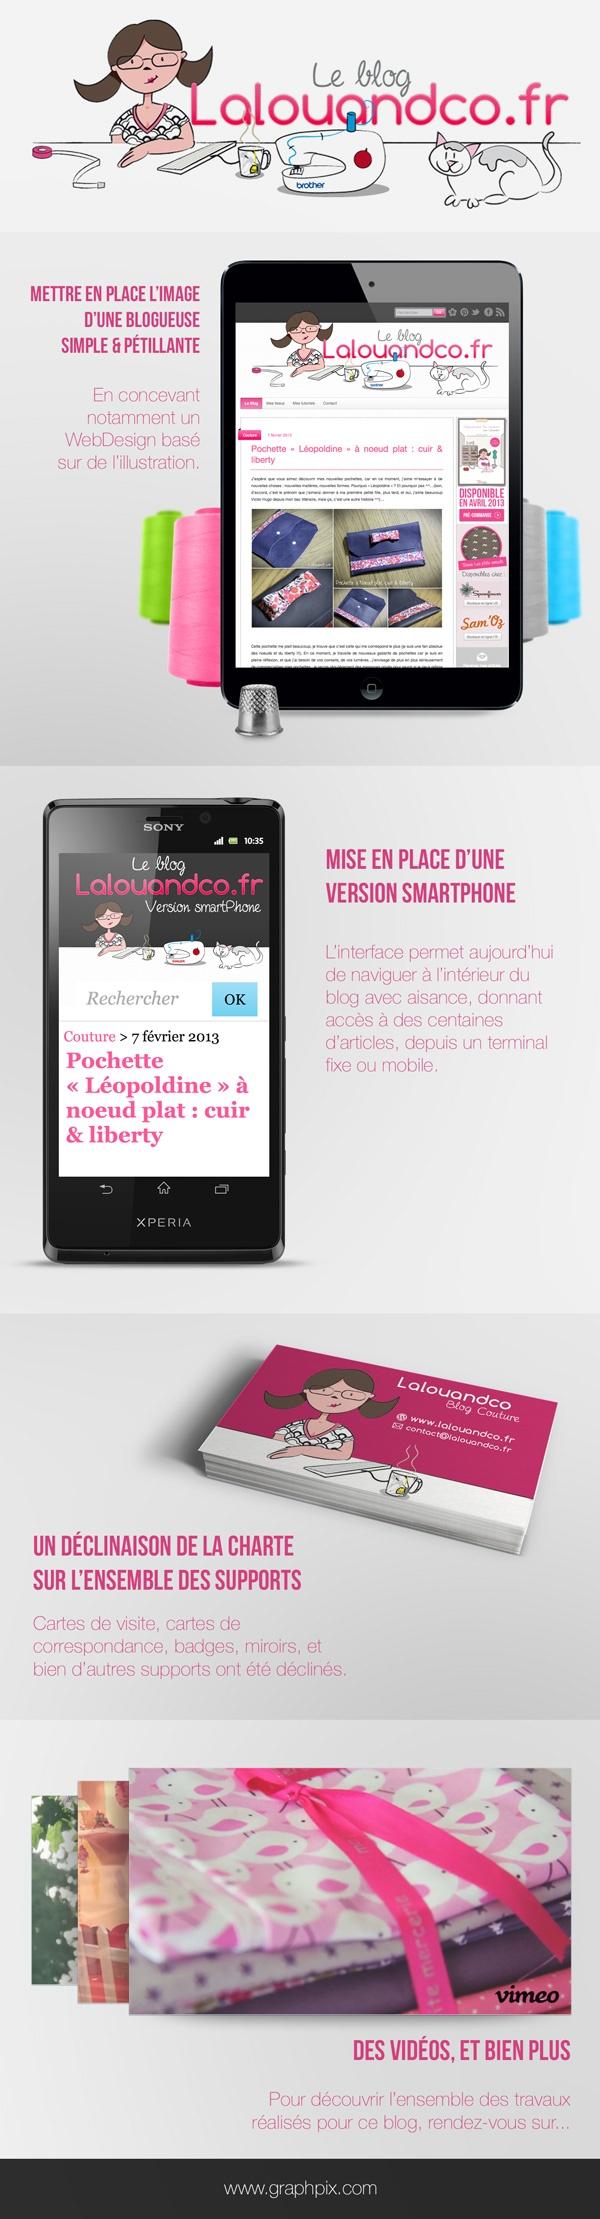 #webdesign #wordpress #developpement #bootstrap #blog #couture